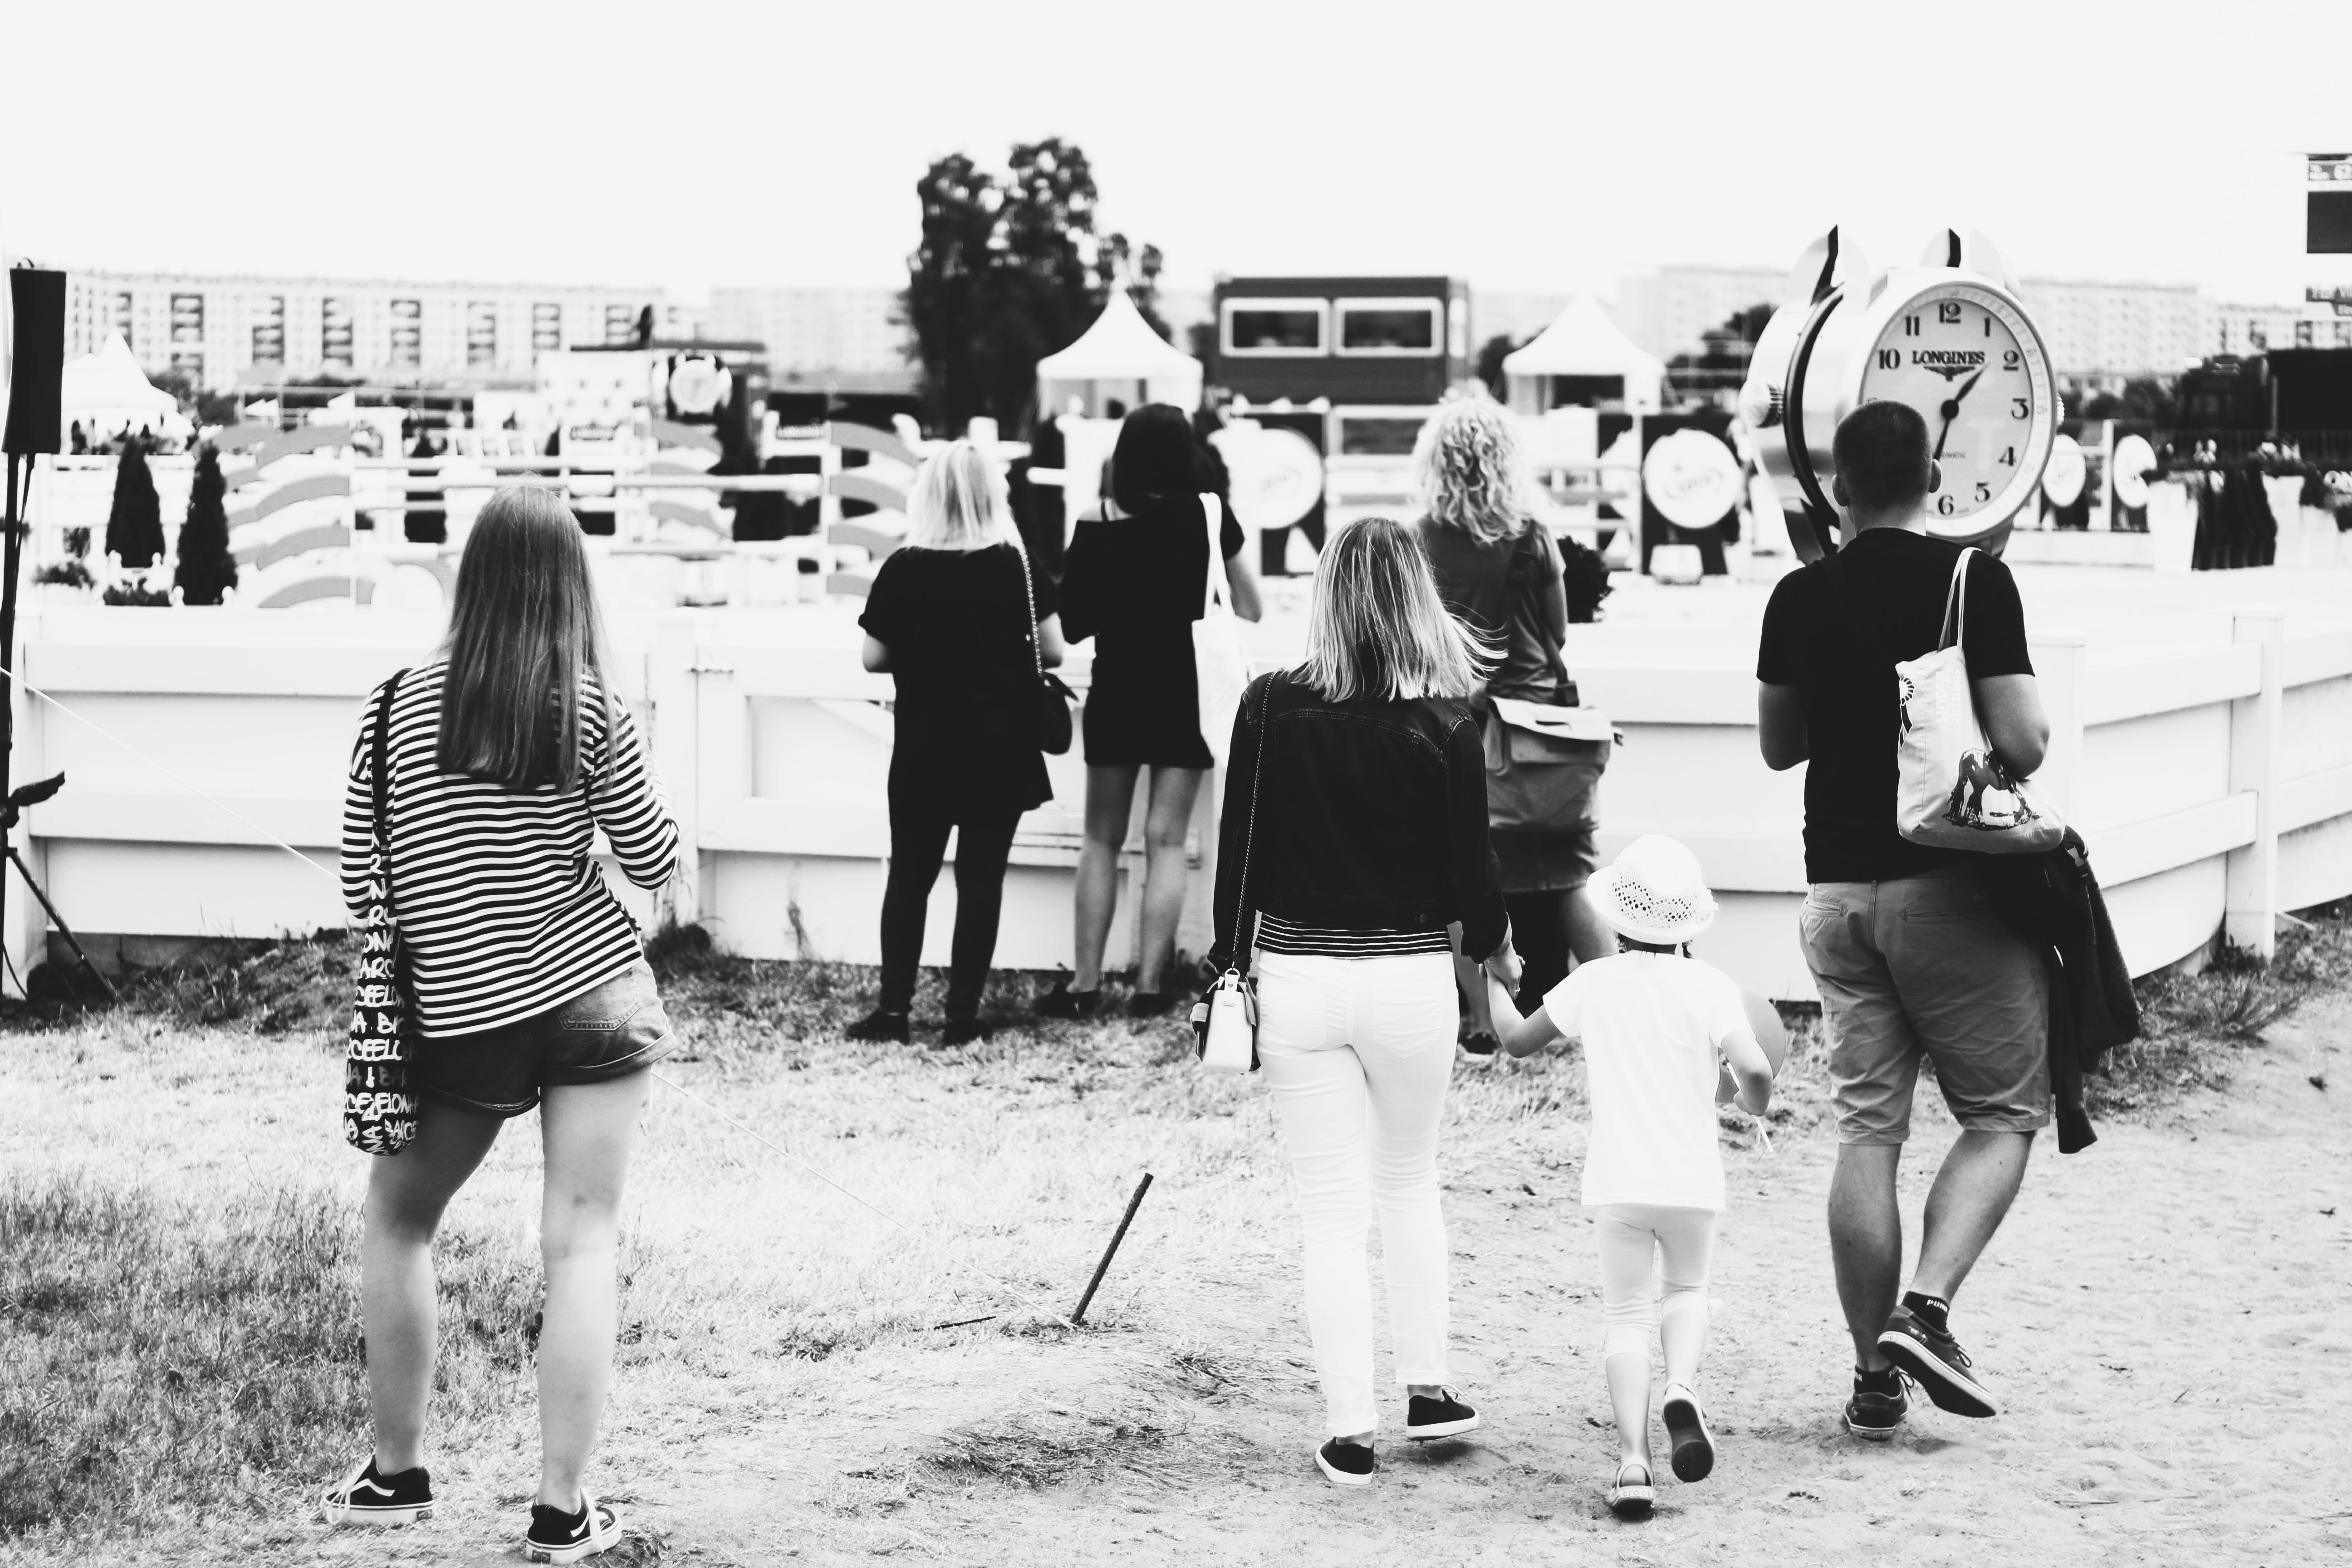 Grayscale Photo of People Gathering Near Clock